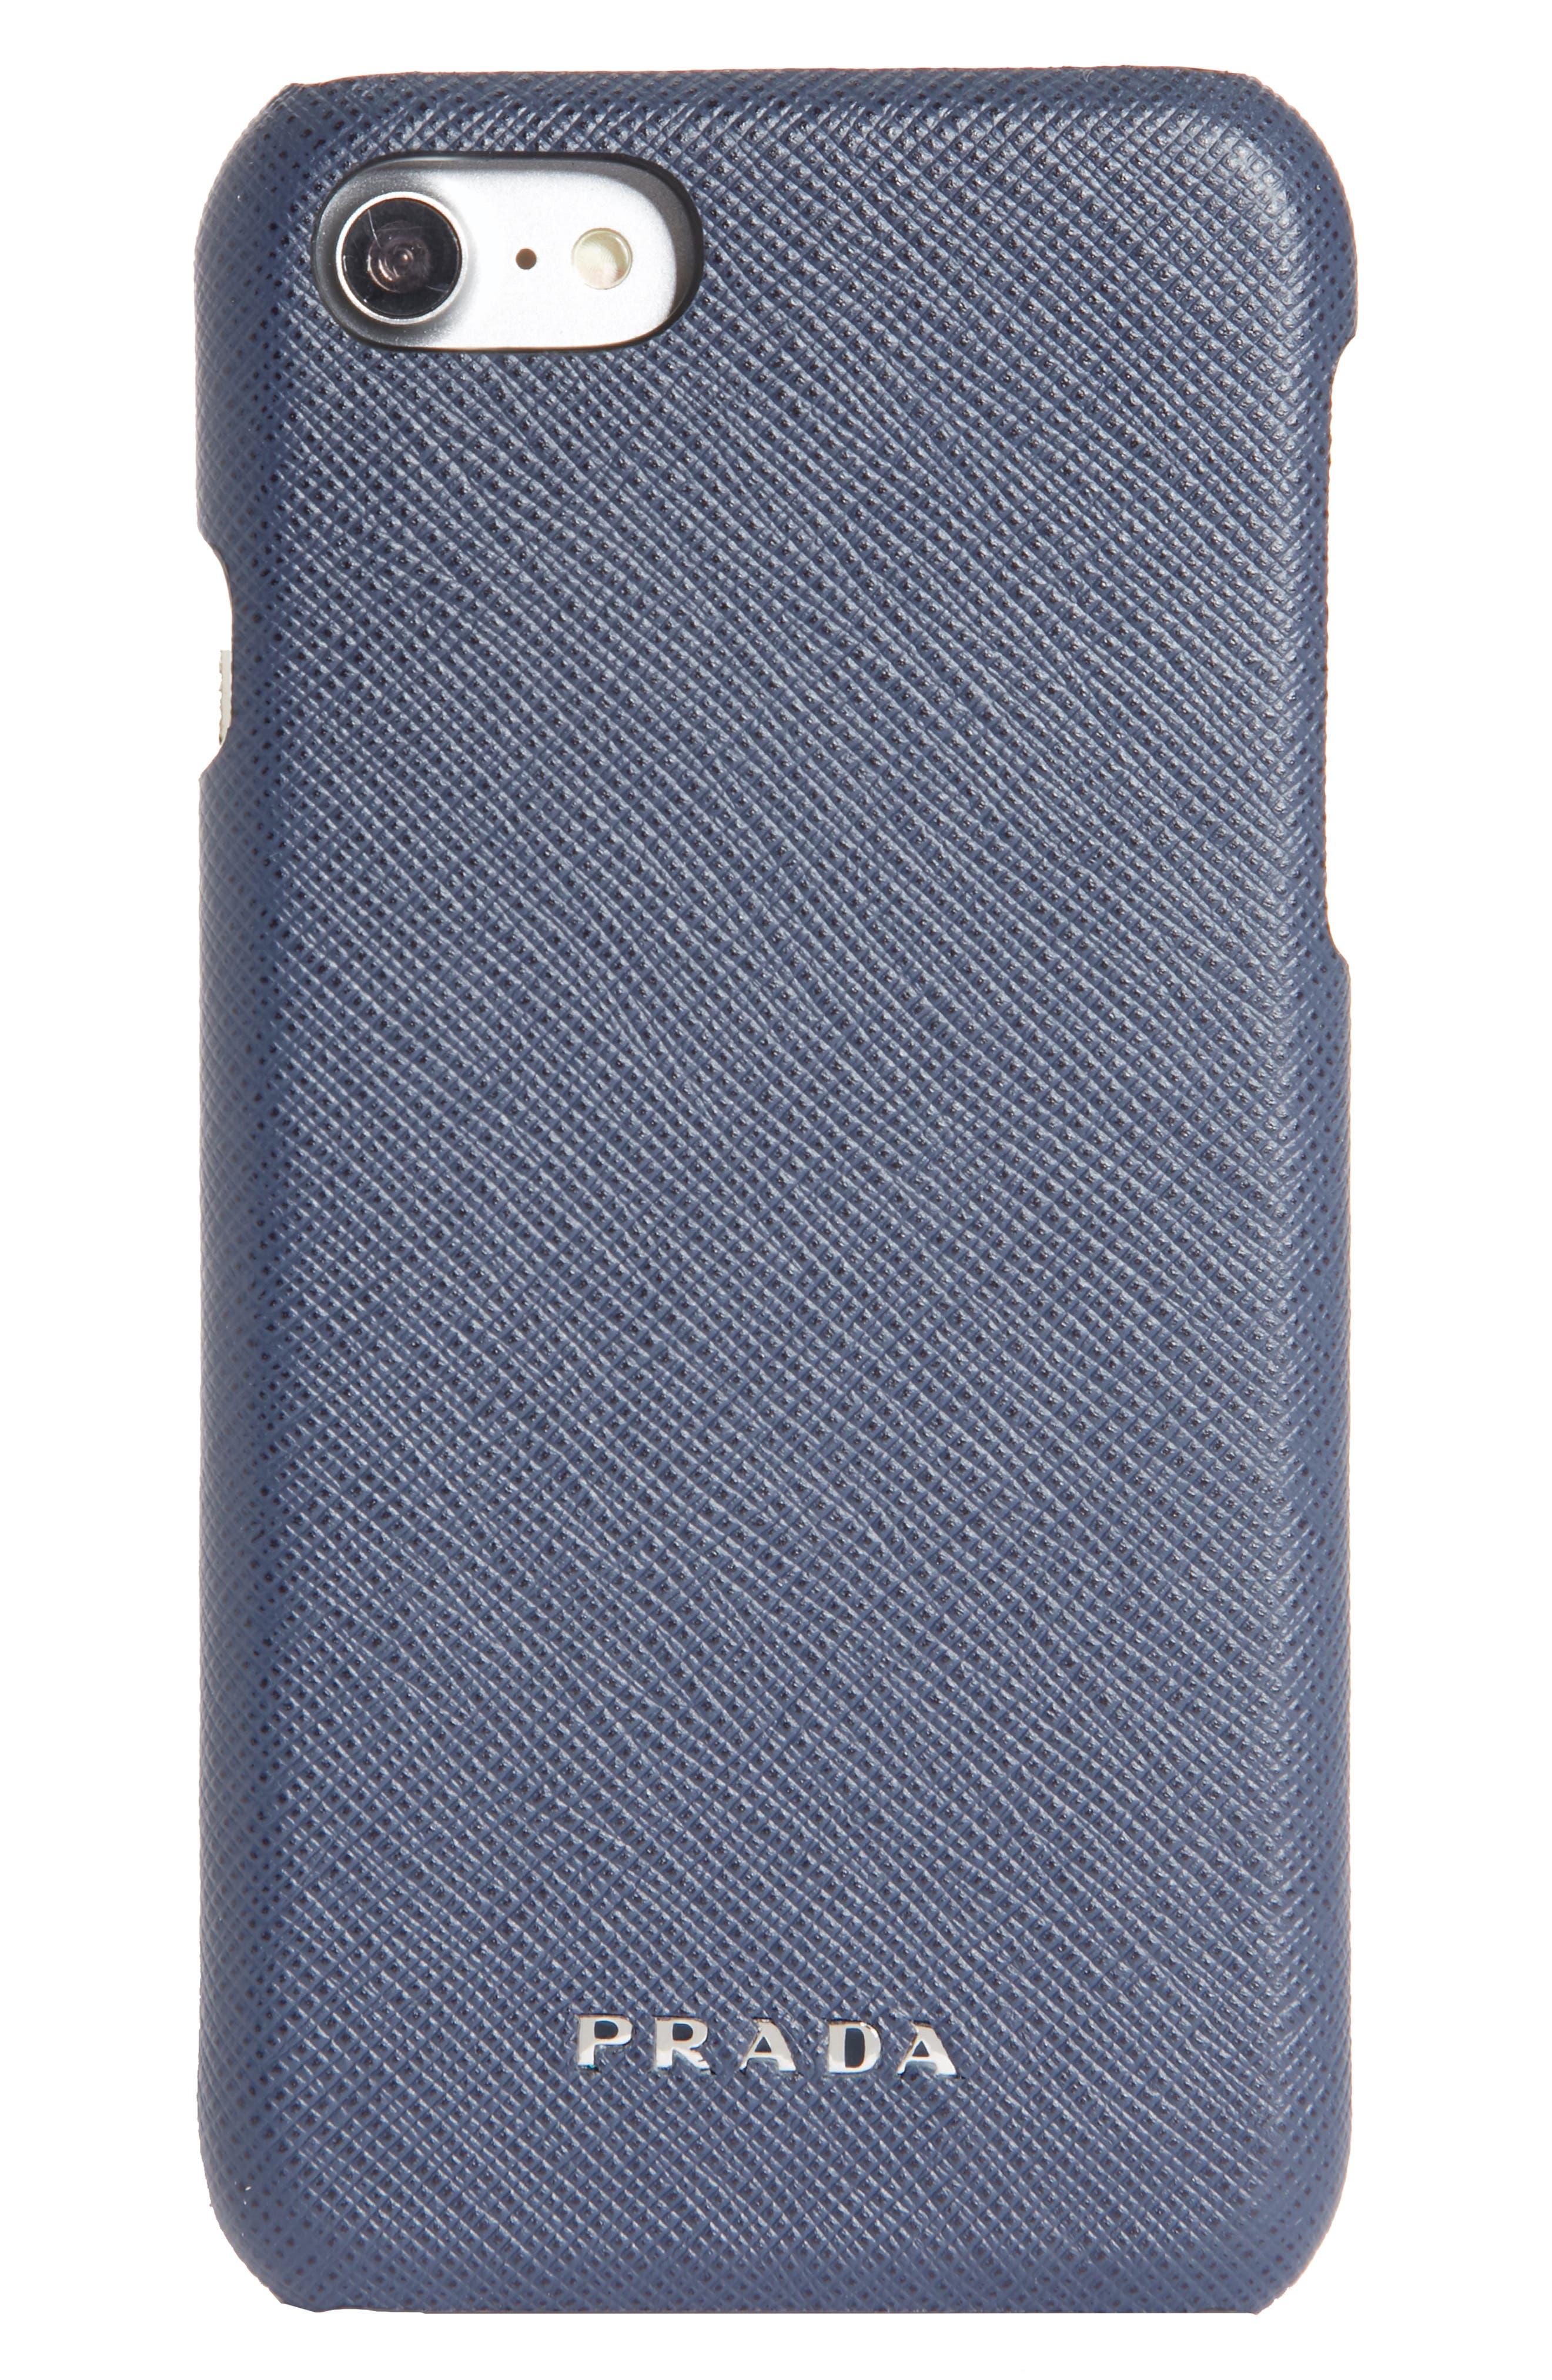 Alternate Image 1 Selected - Prada Saffiano Leather iPhone 6/6s/7/8 Case